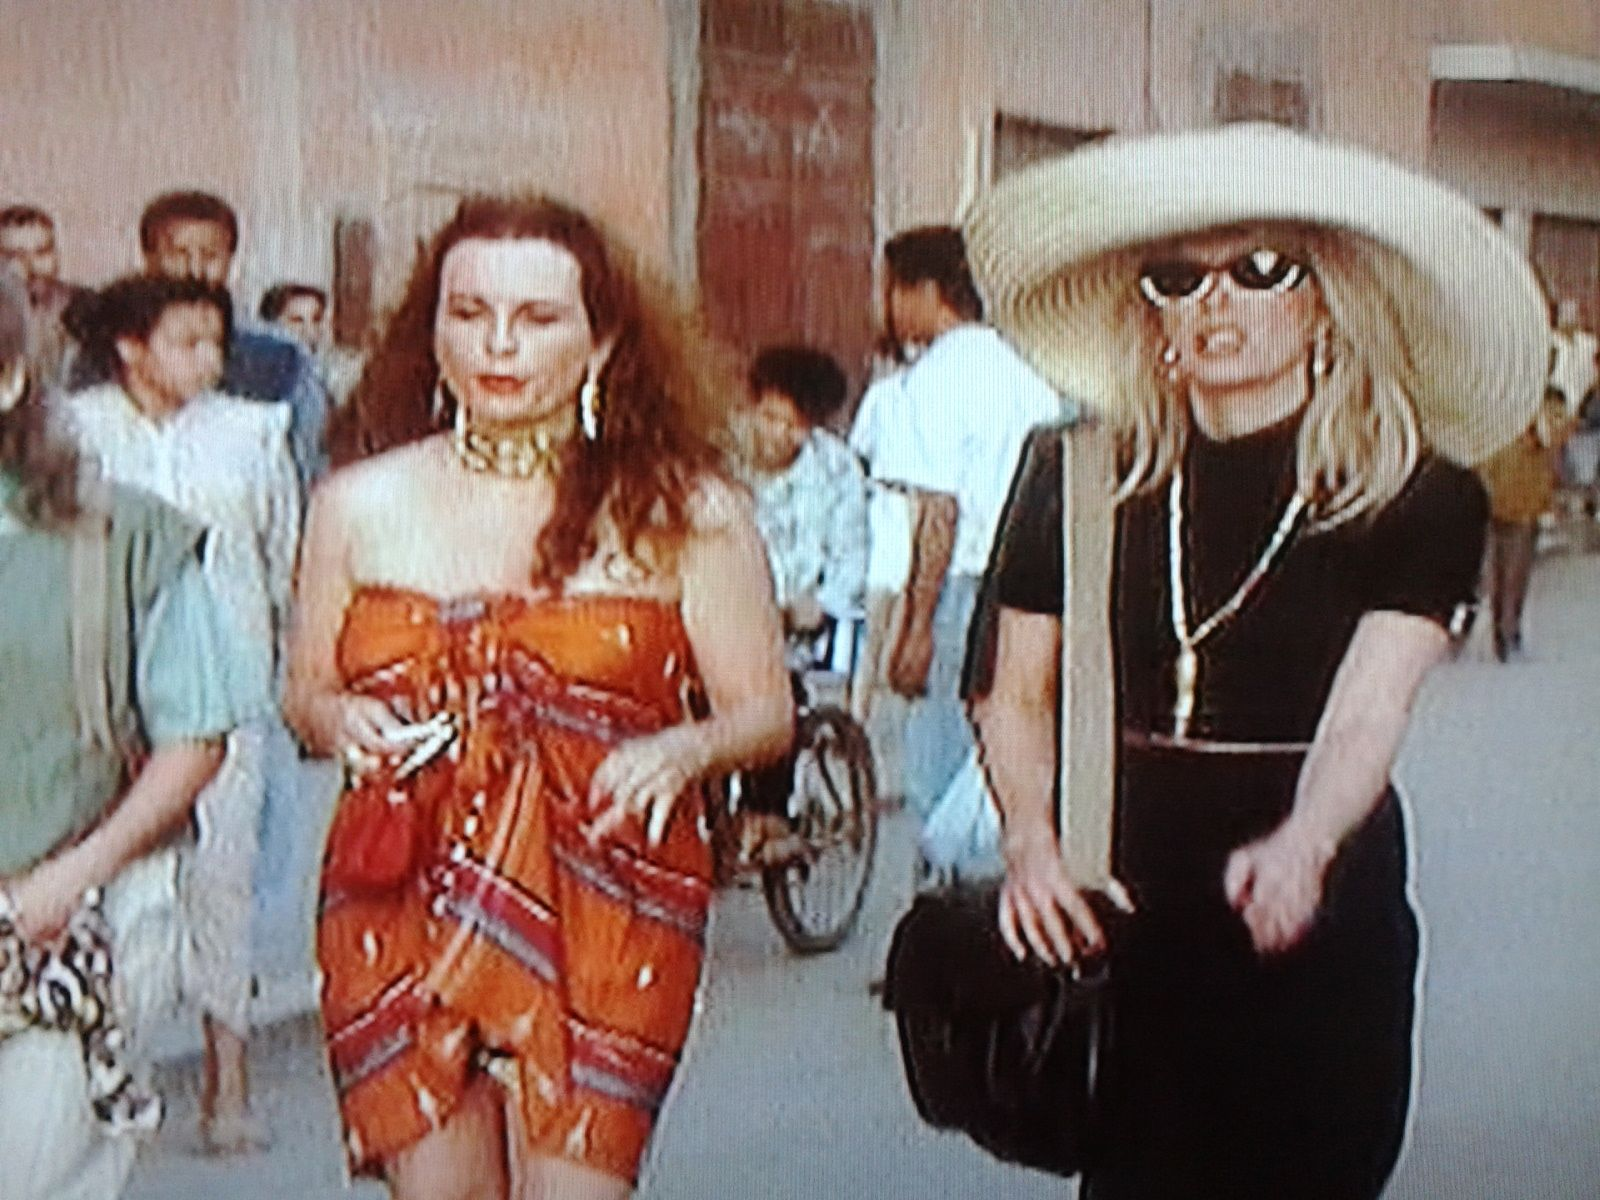 edina monsoon \u0026 patsy stone in Morocco. Love this episode ...